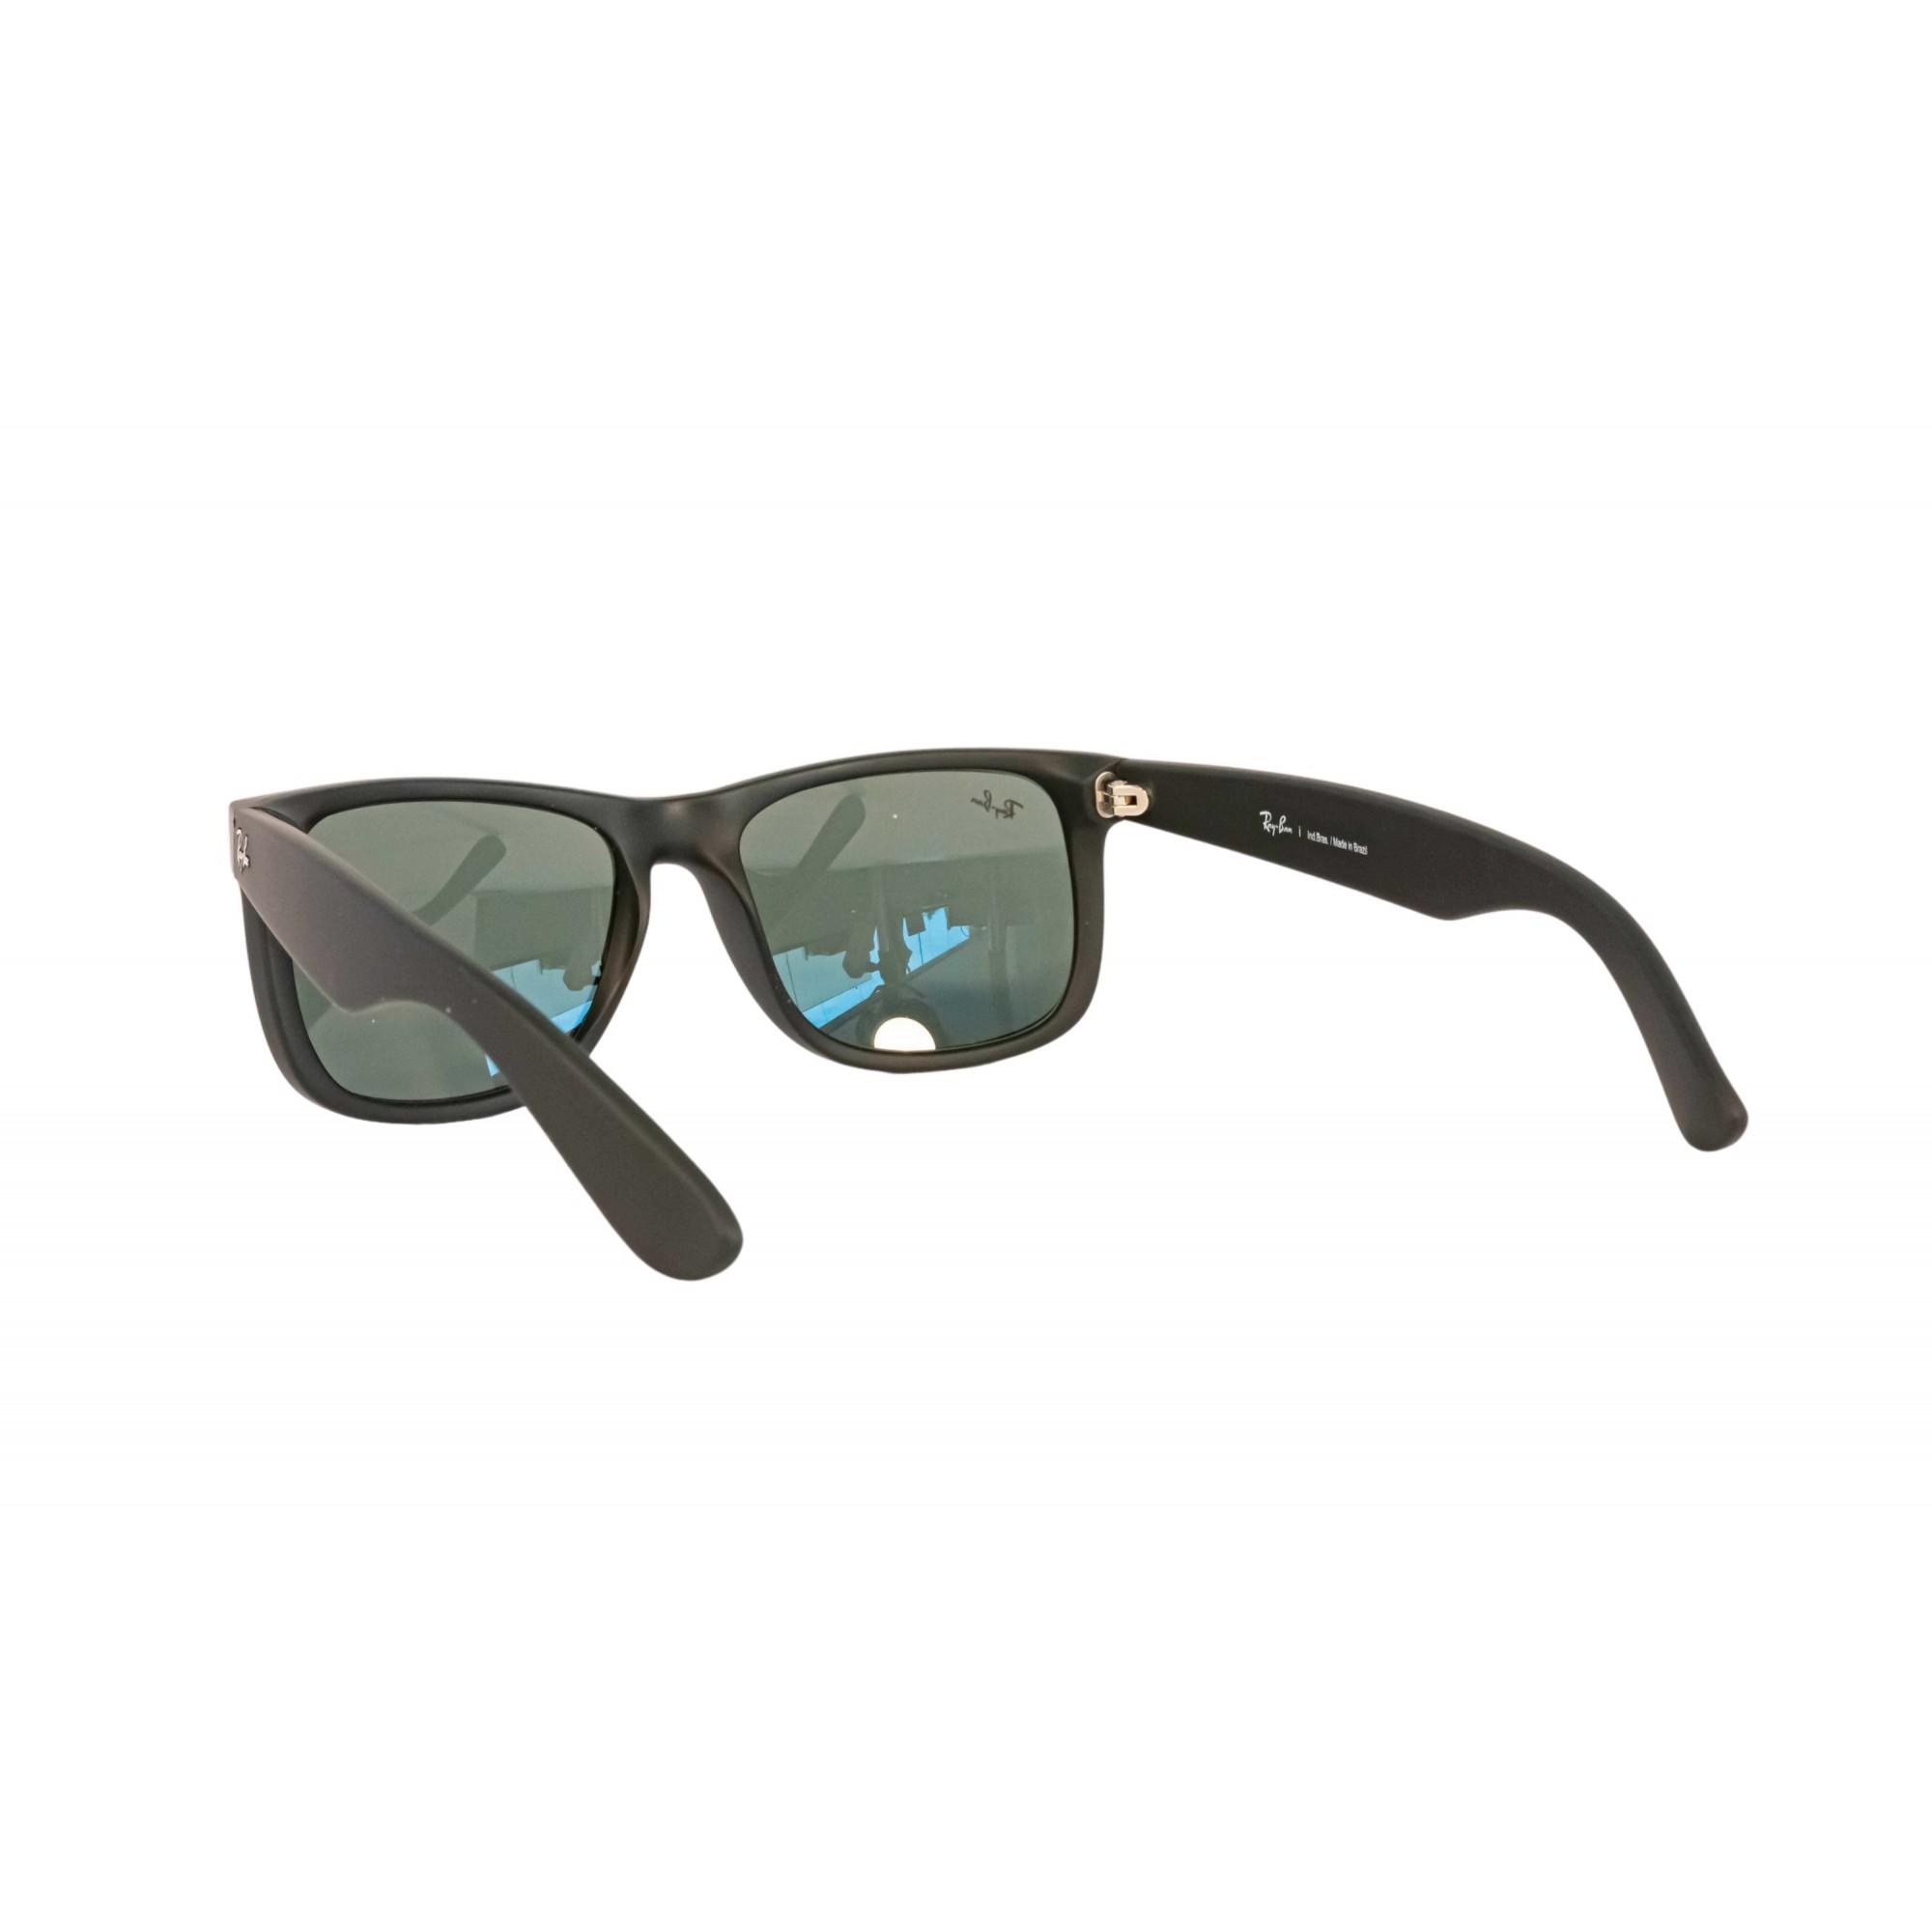 Óculos Ray Ban Justin Rb4165l 62271 55 Preto